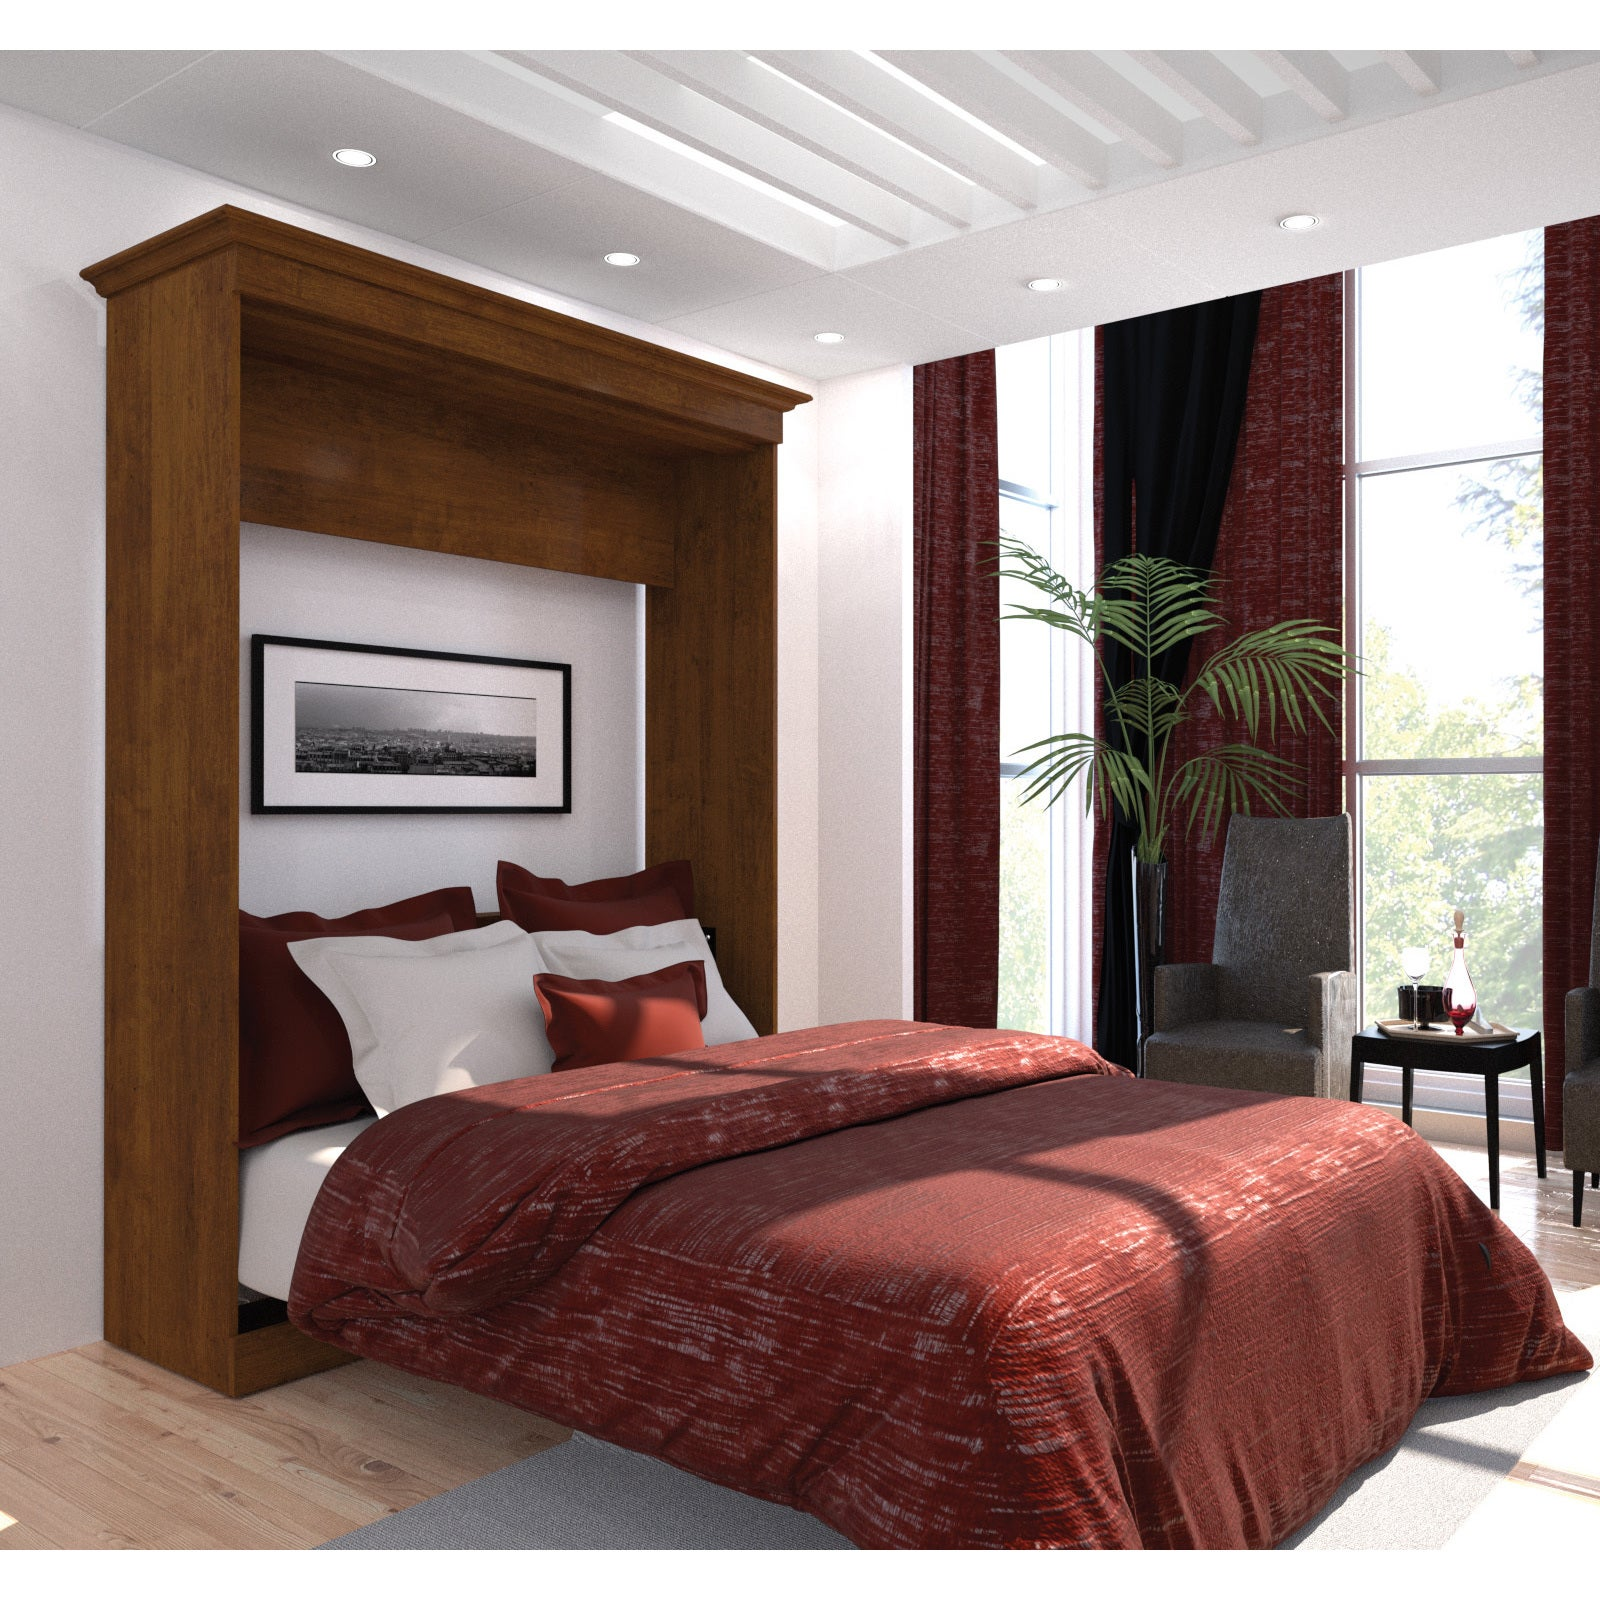 Versatile by Bestar 69-inch Queen-size Wall Bed (Brown)